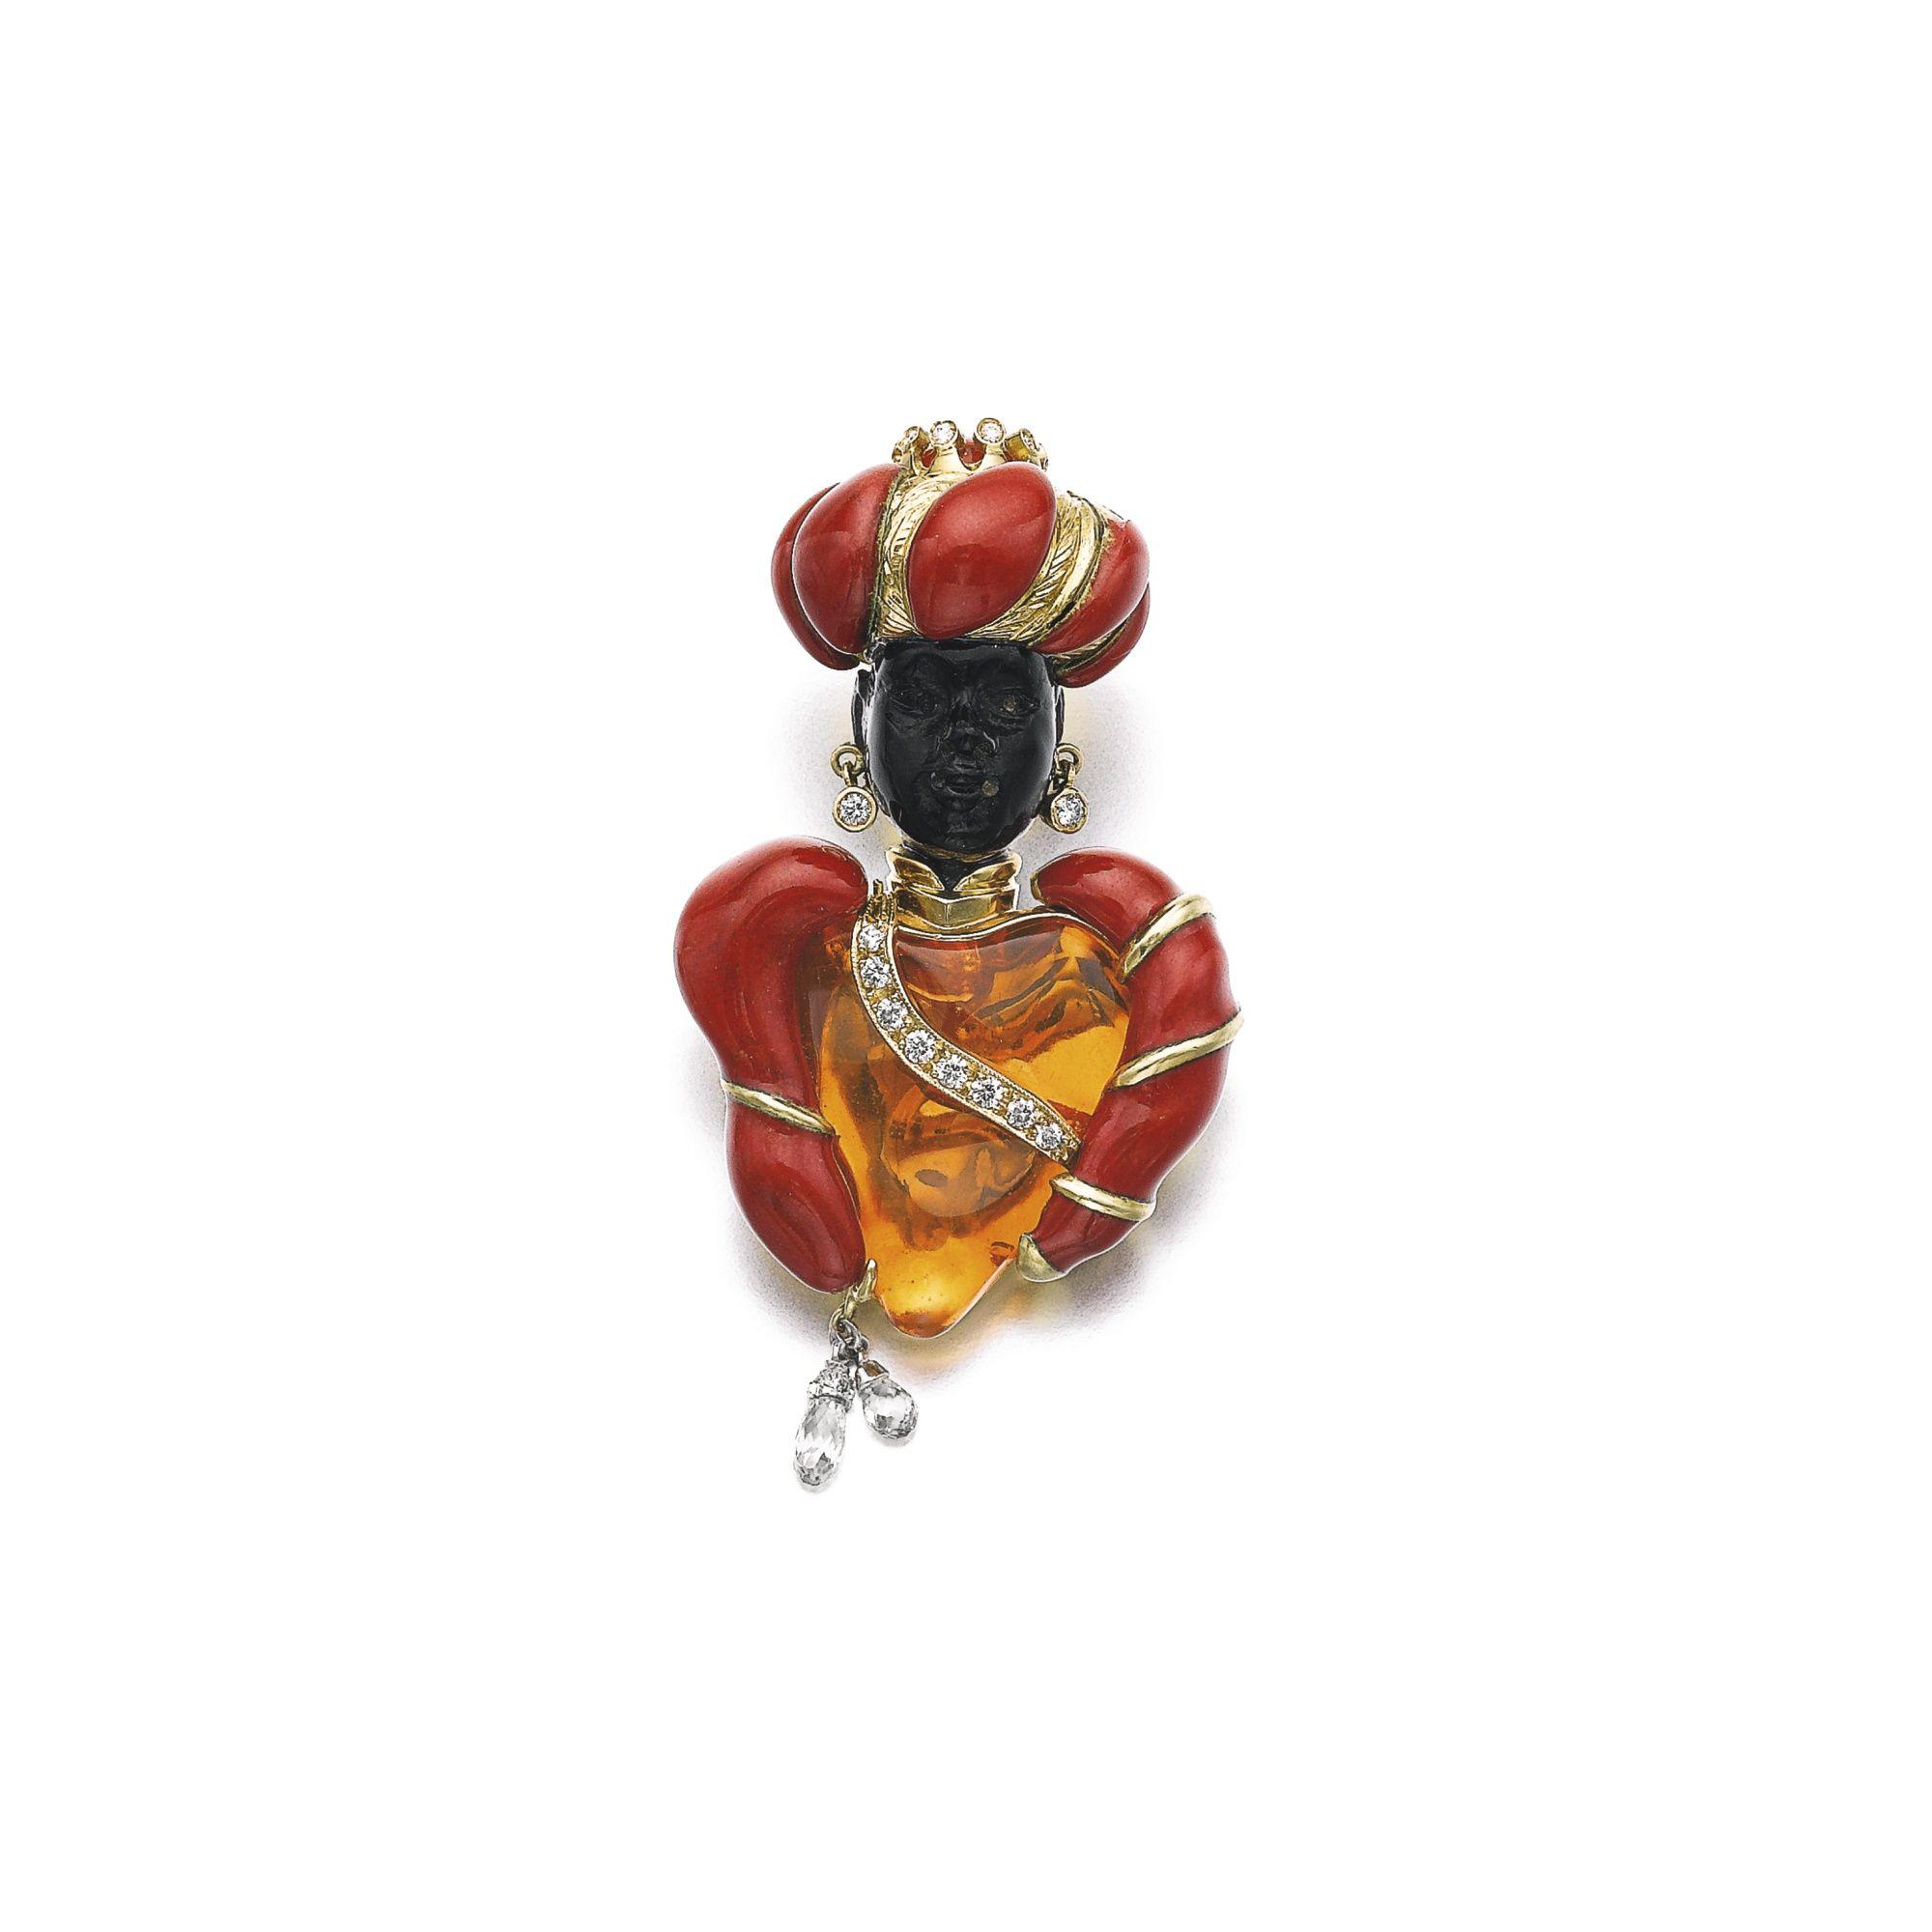 56c6dd38fa1ff9b43bc74eb4c9e46da5 Top Result 50 Unique Diamond Fire Glass Image 2017 Pkt6